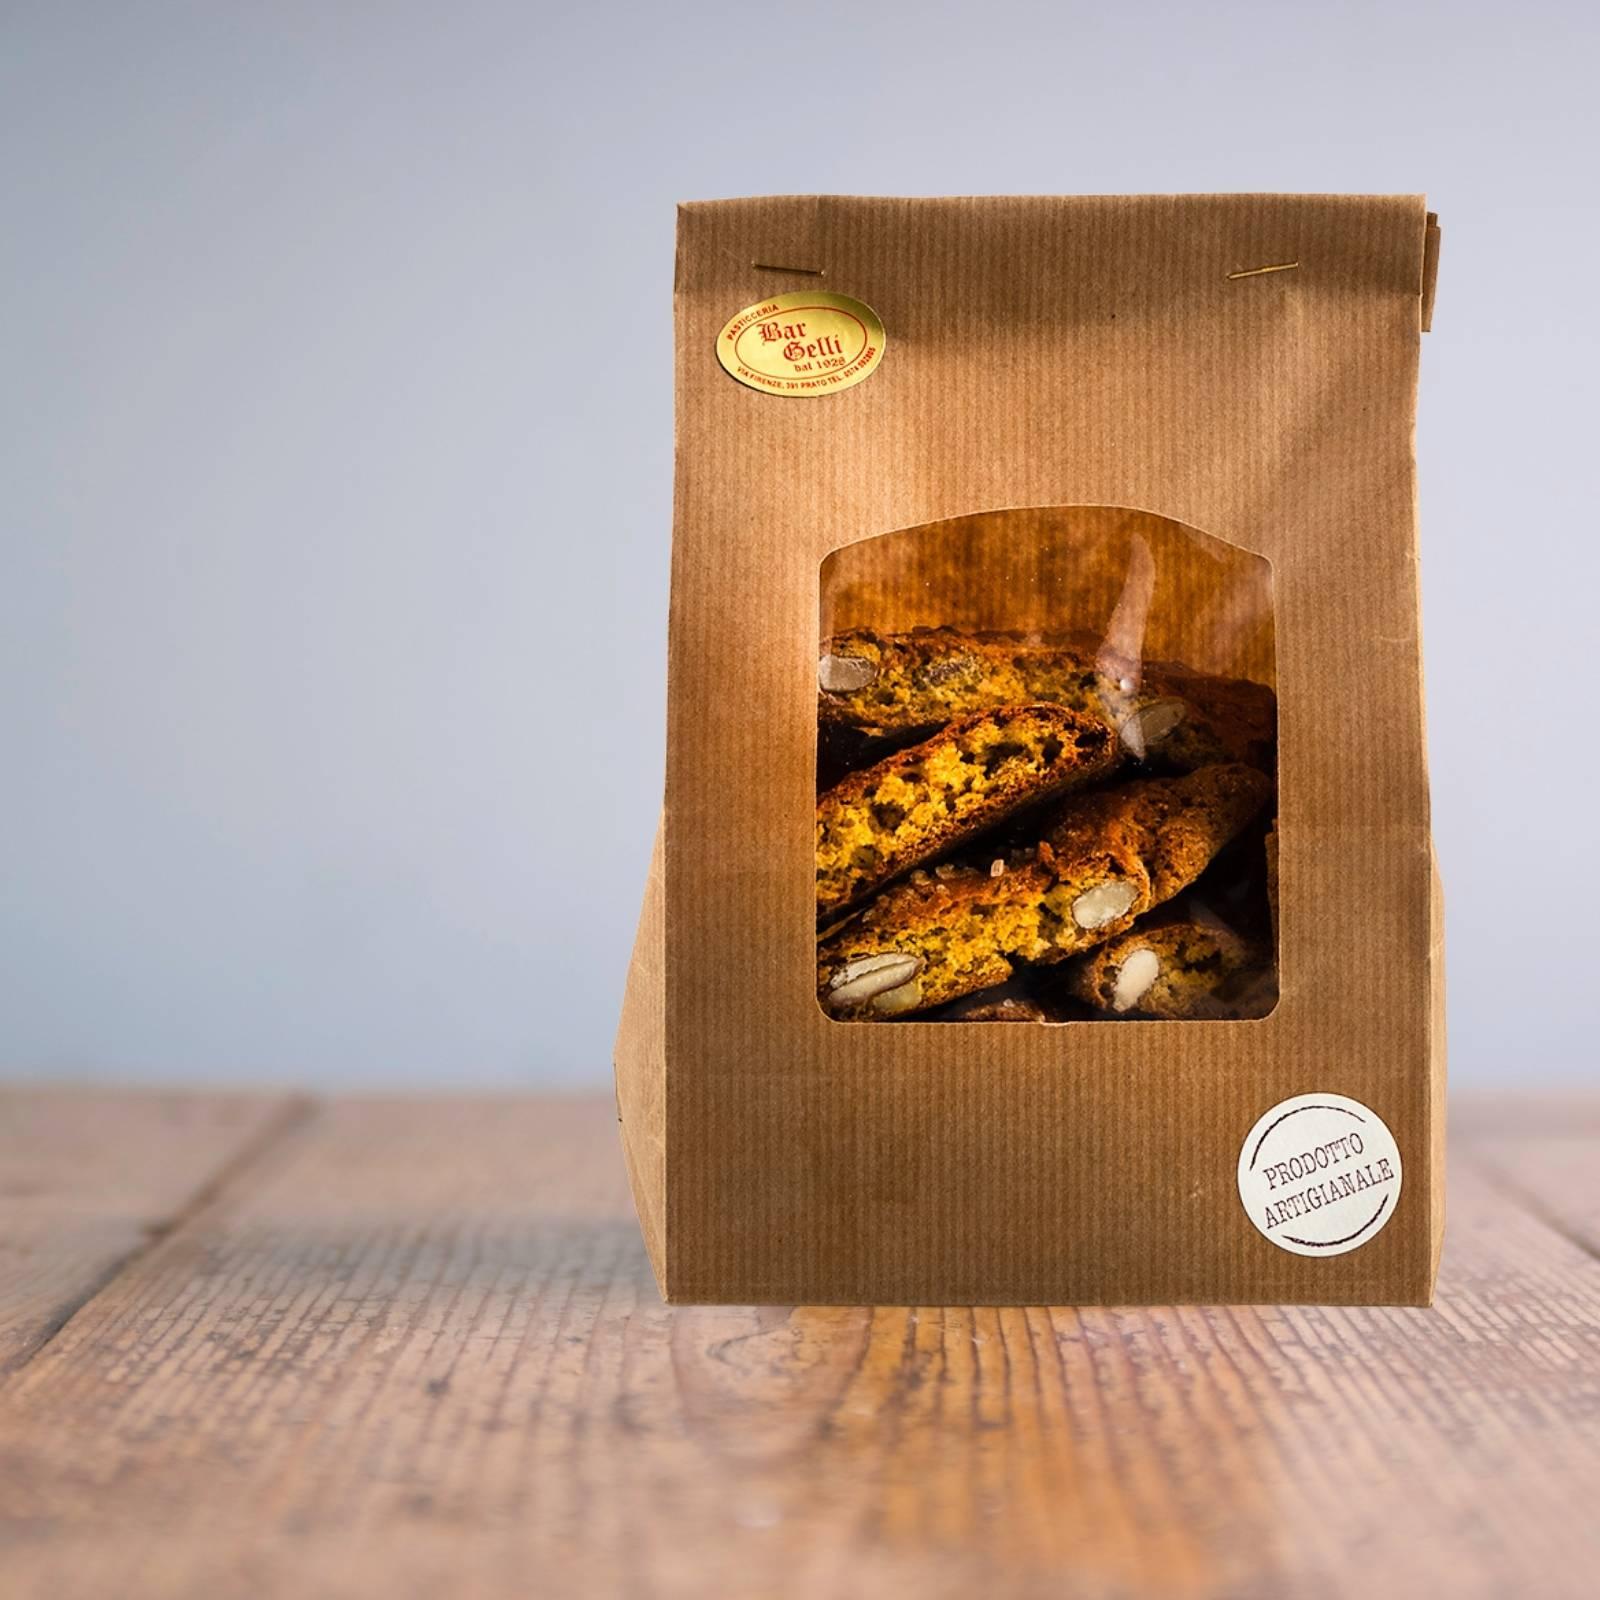 Bar Pasticceria Gelli Biscotti di Prato